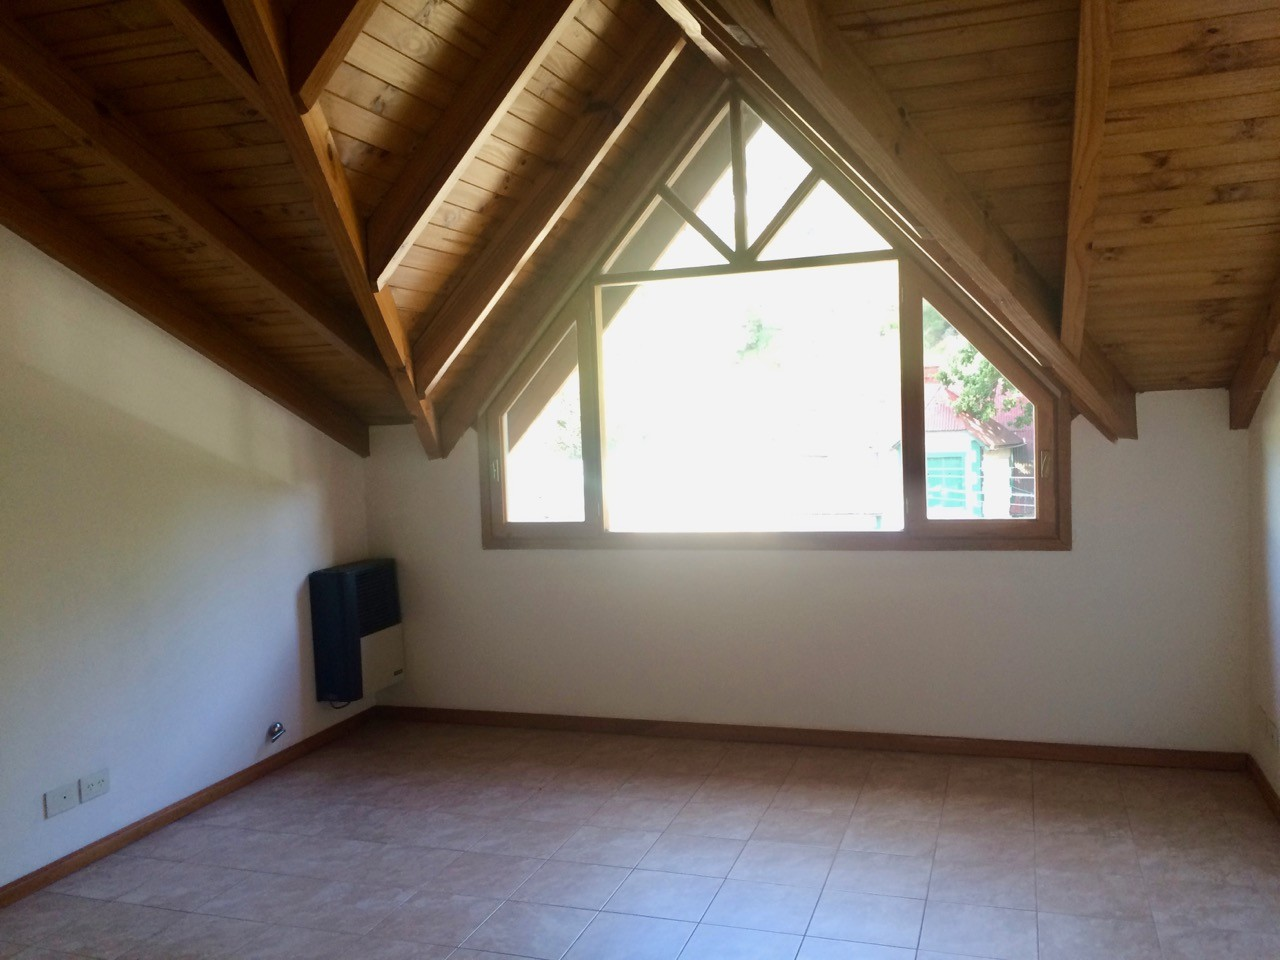 D175 - Departamento 1 dormitorio- tipo duplex - 50 m2